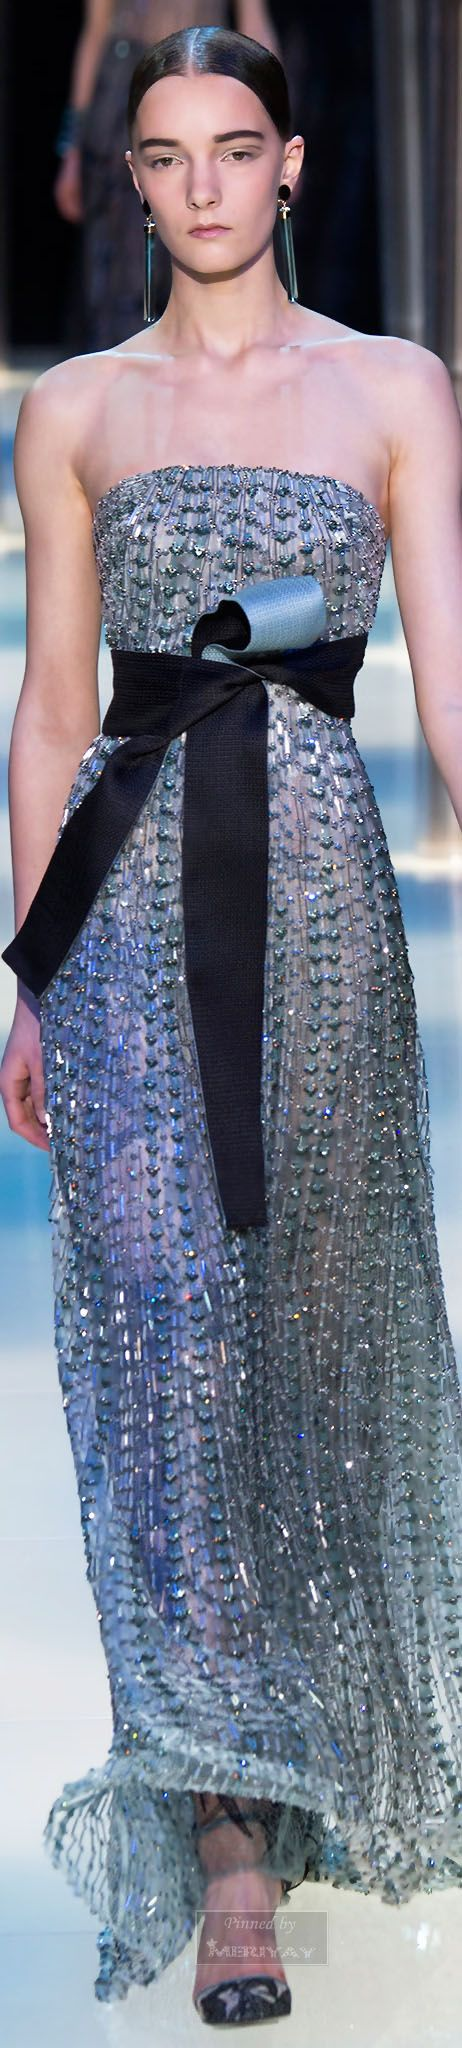 Armani Privé Couture, Spring 2015